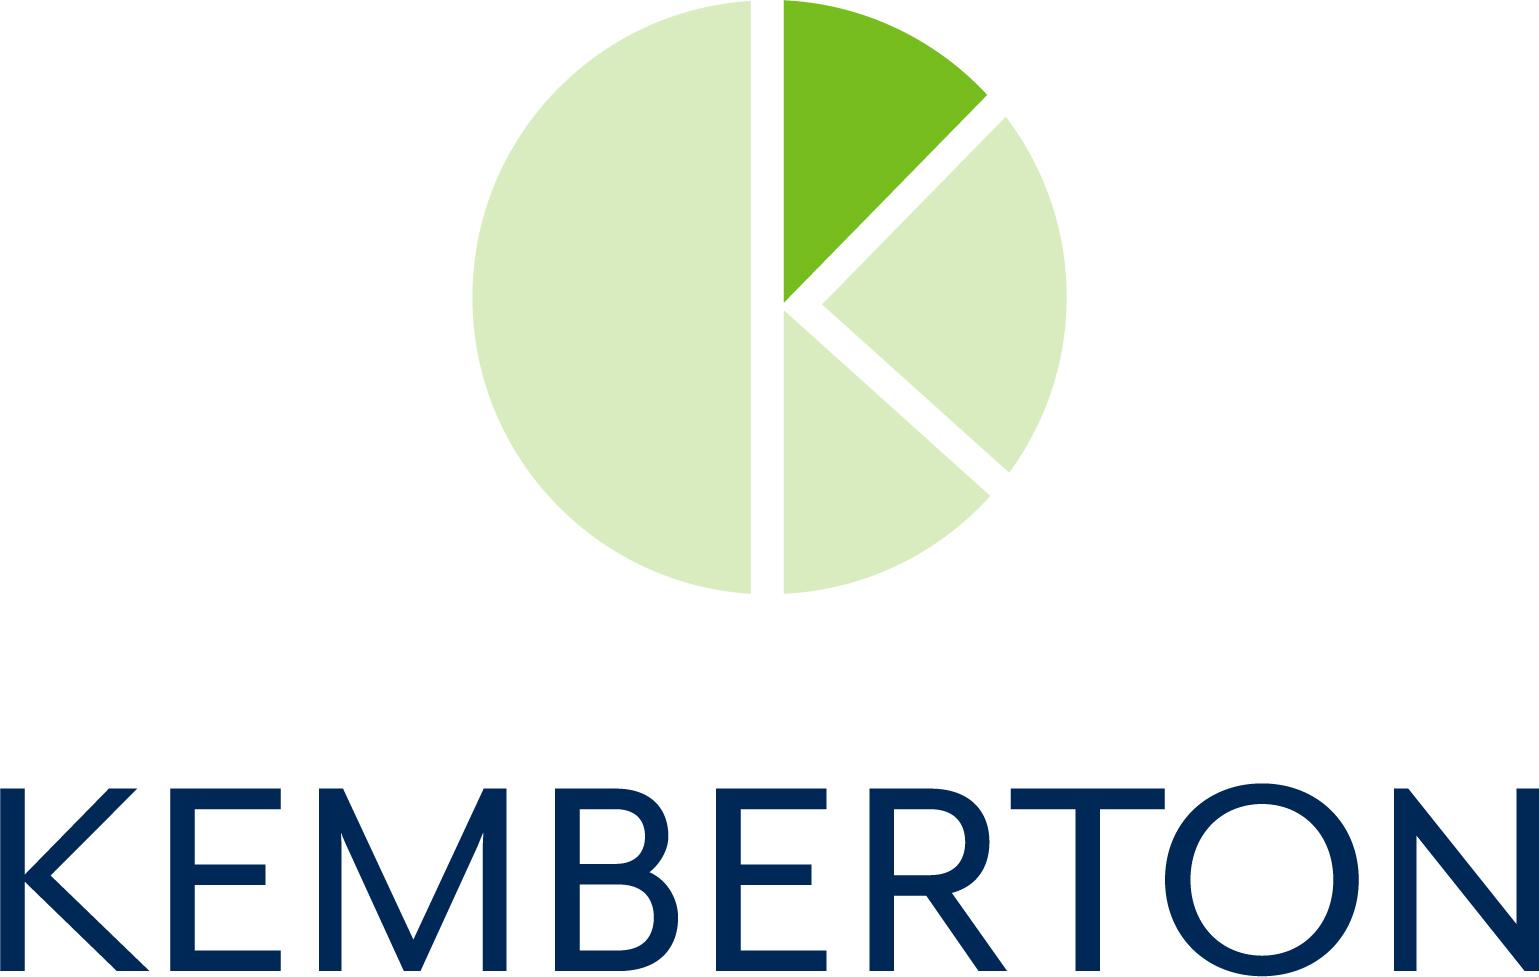 Kemberton Healthcare Services